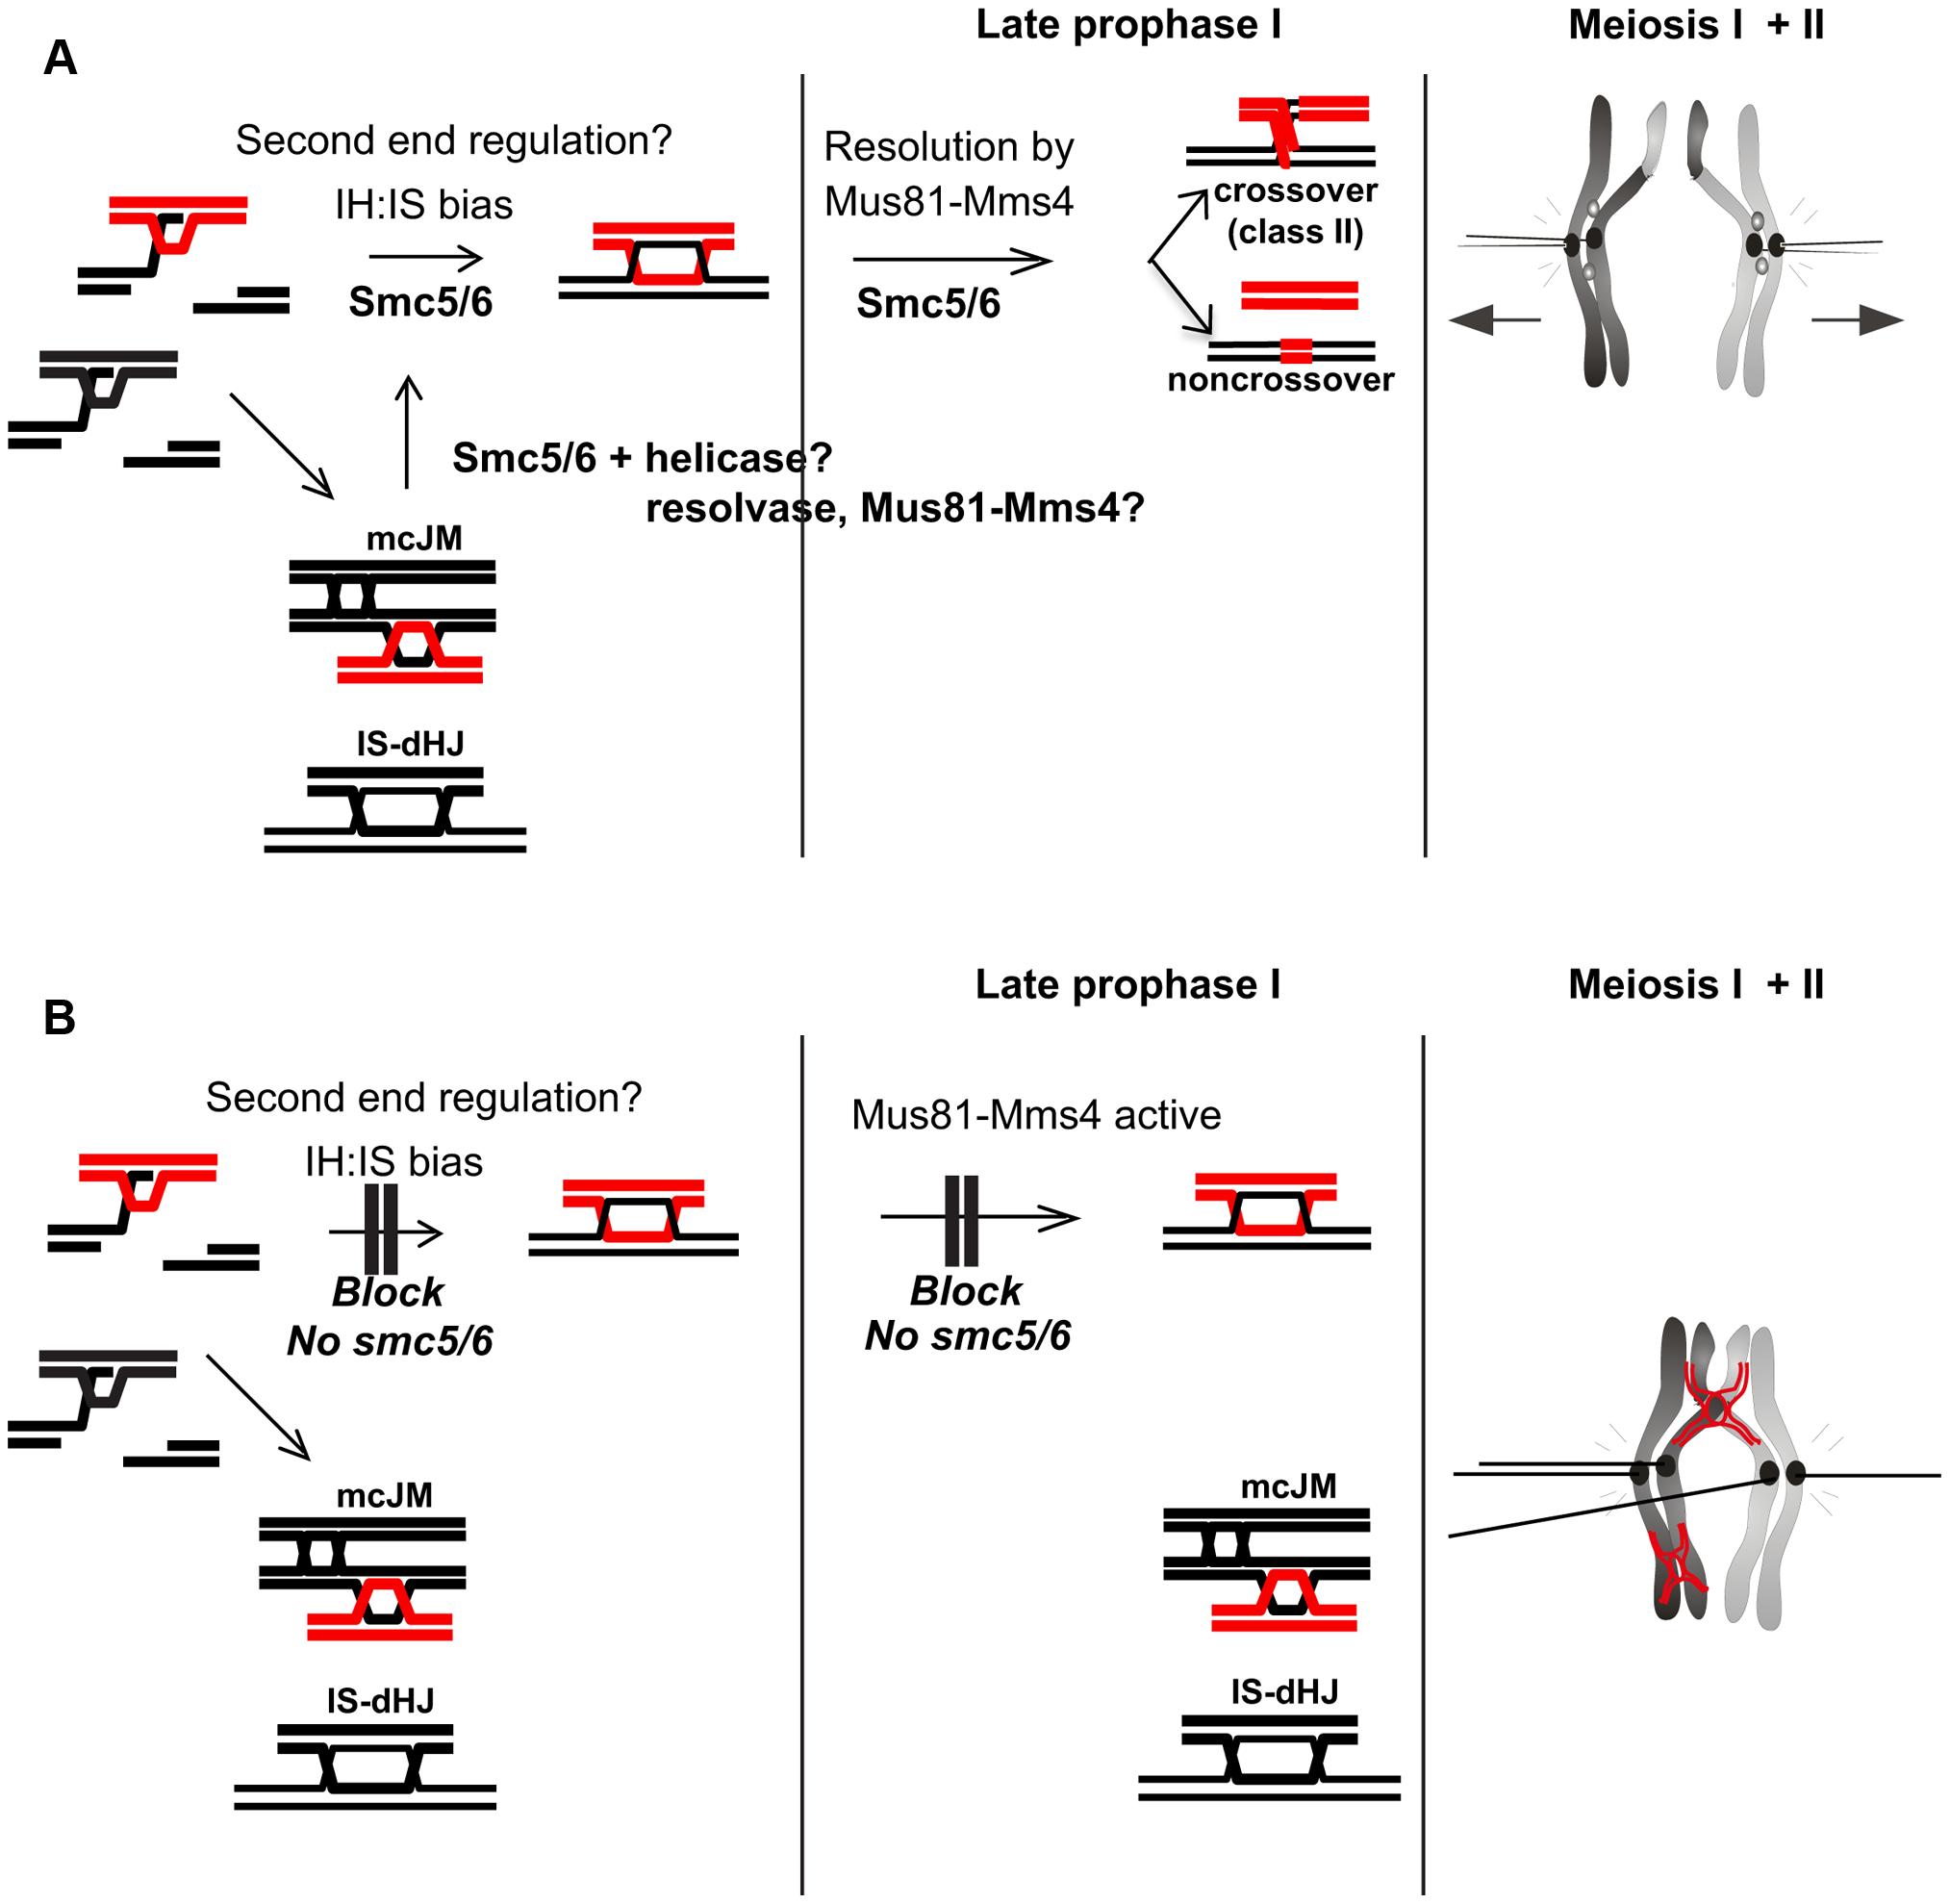 Model for Smc5/6 function during meiosis.